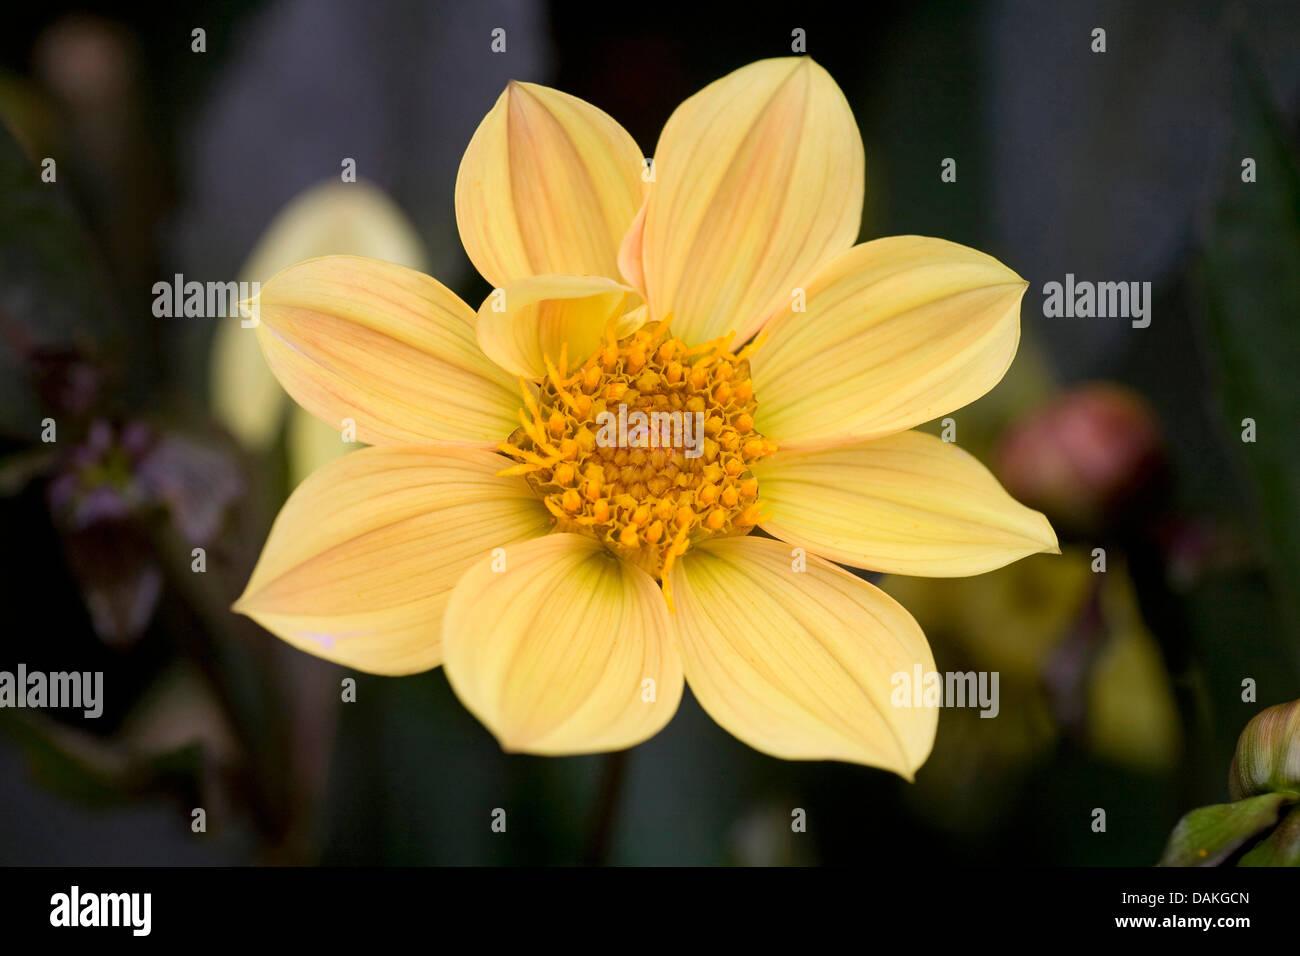 georgina (Dahlia 'Summertime', Dahlia Summertime), cultivar Summertime - Stock Image